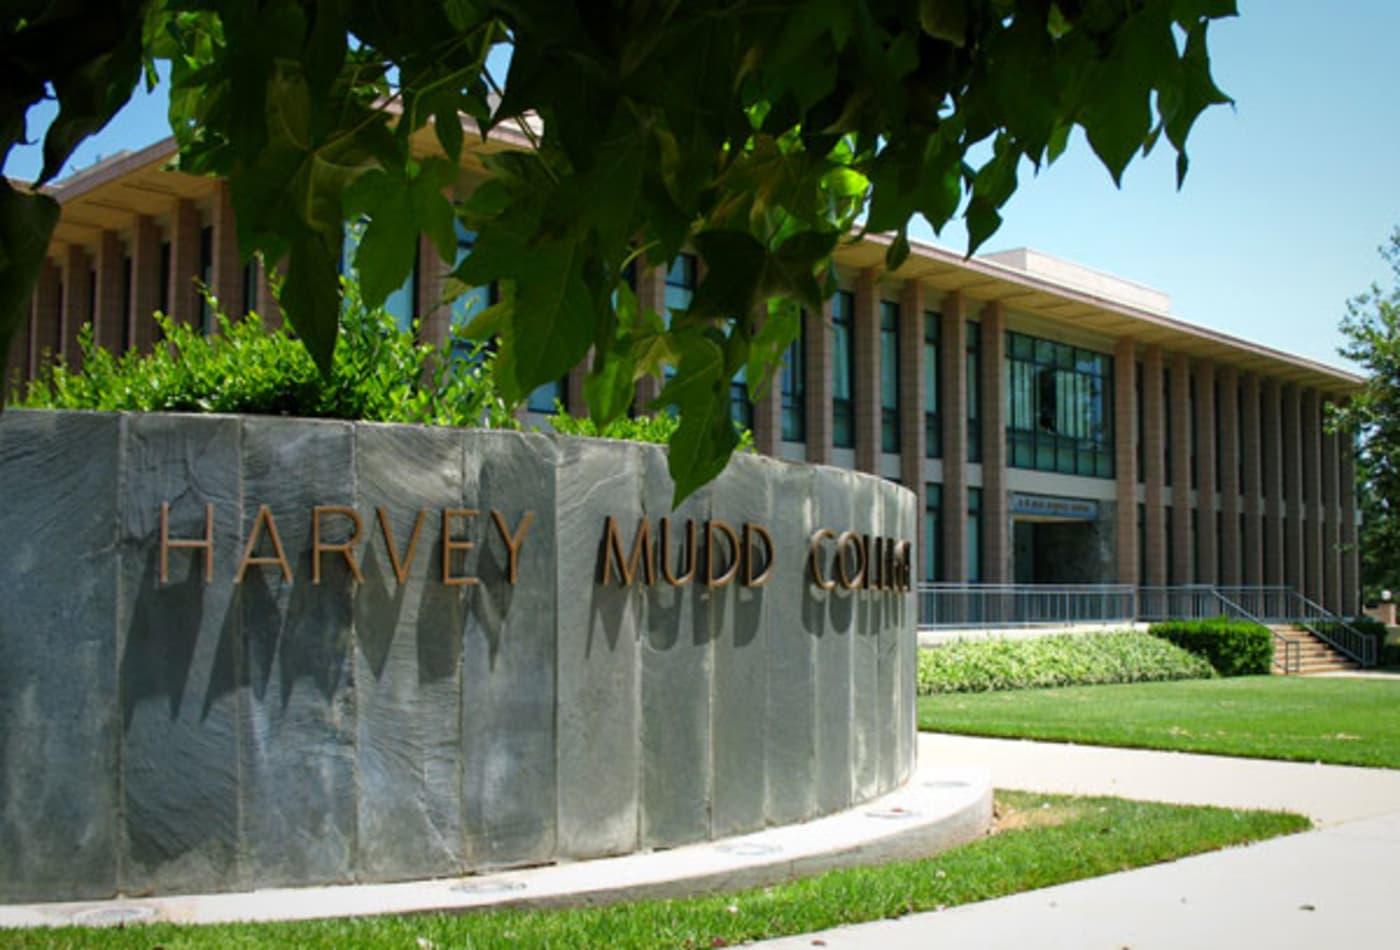 Harvey-Mudd-Colleges-Highest-Paychecks-2012-CNBC.jpg